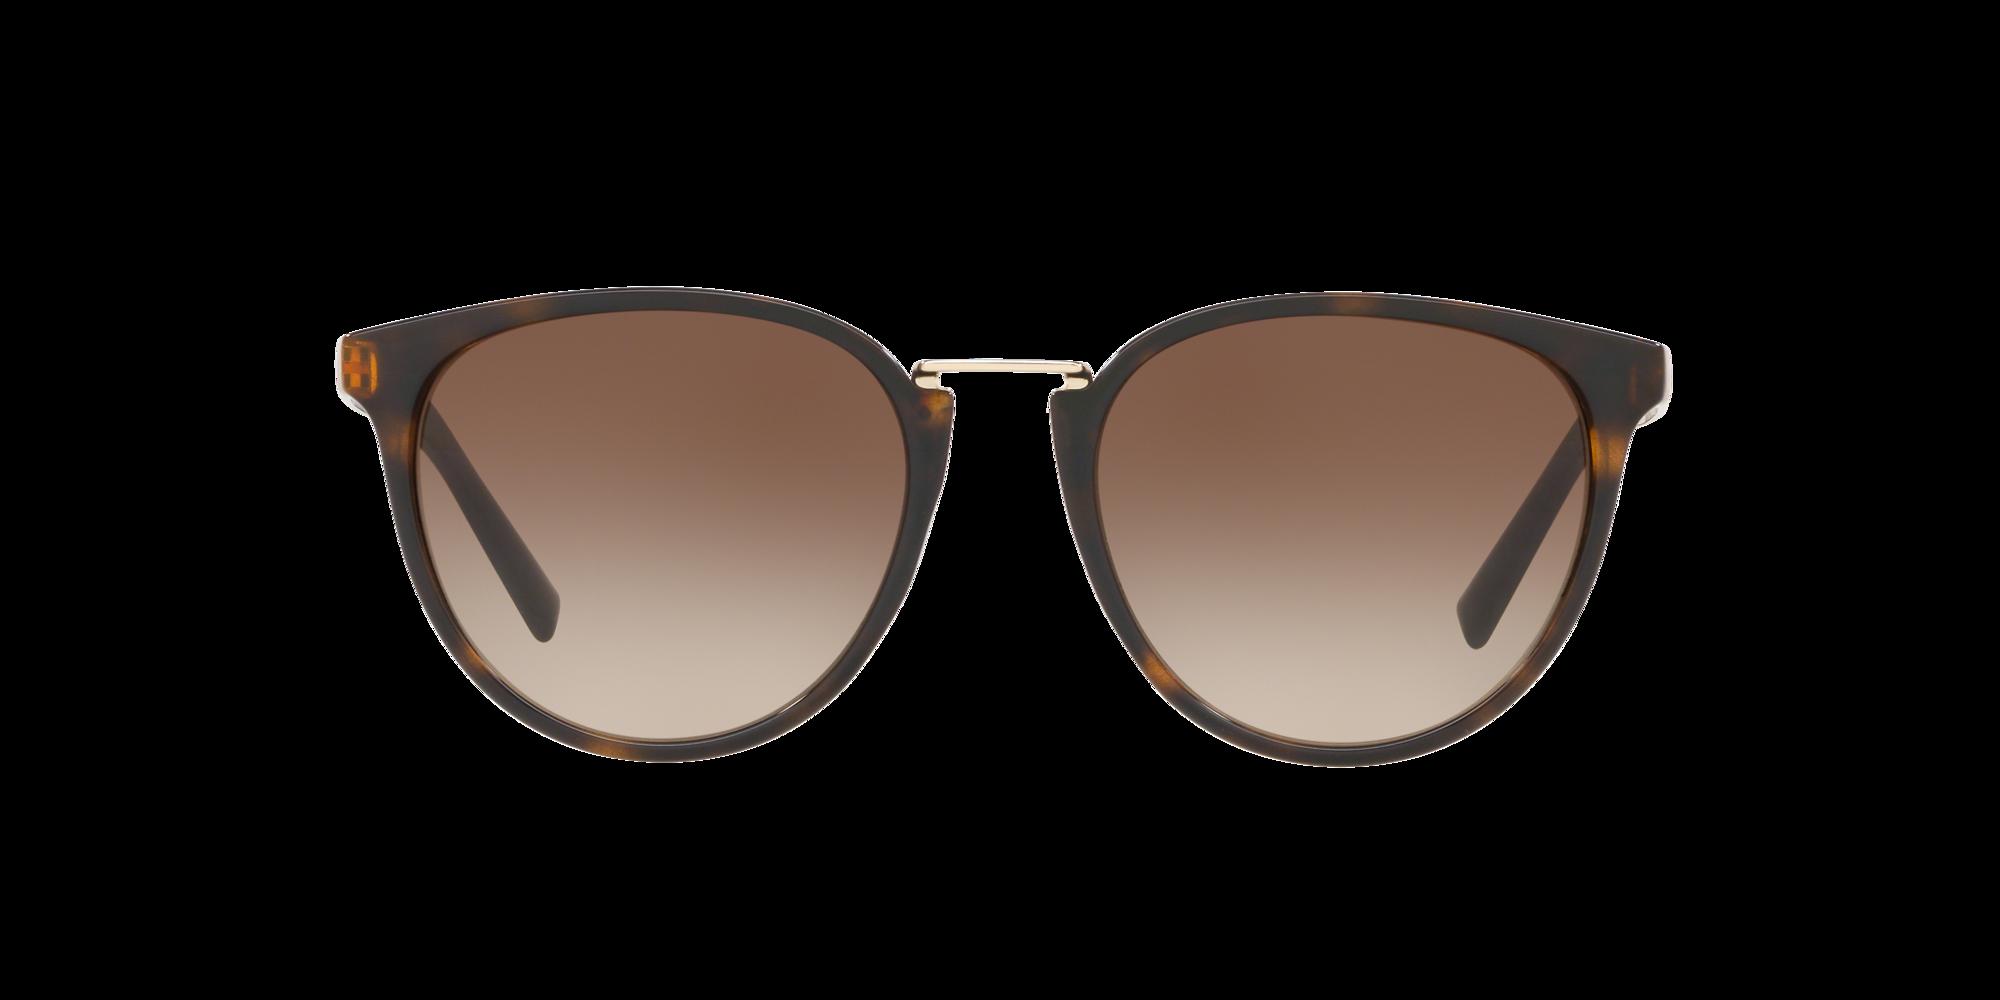 Image for VE4366 54 from LensCrafters | Glasses, Prescription Glasses Online, Eyewear